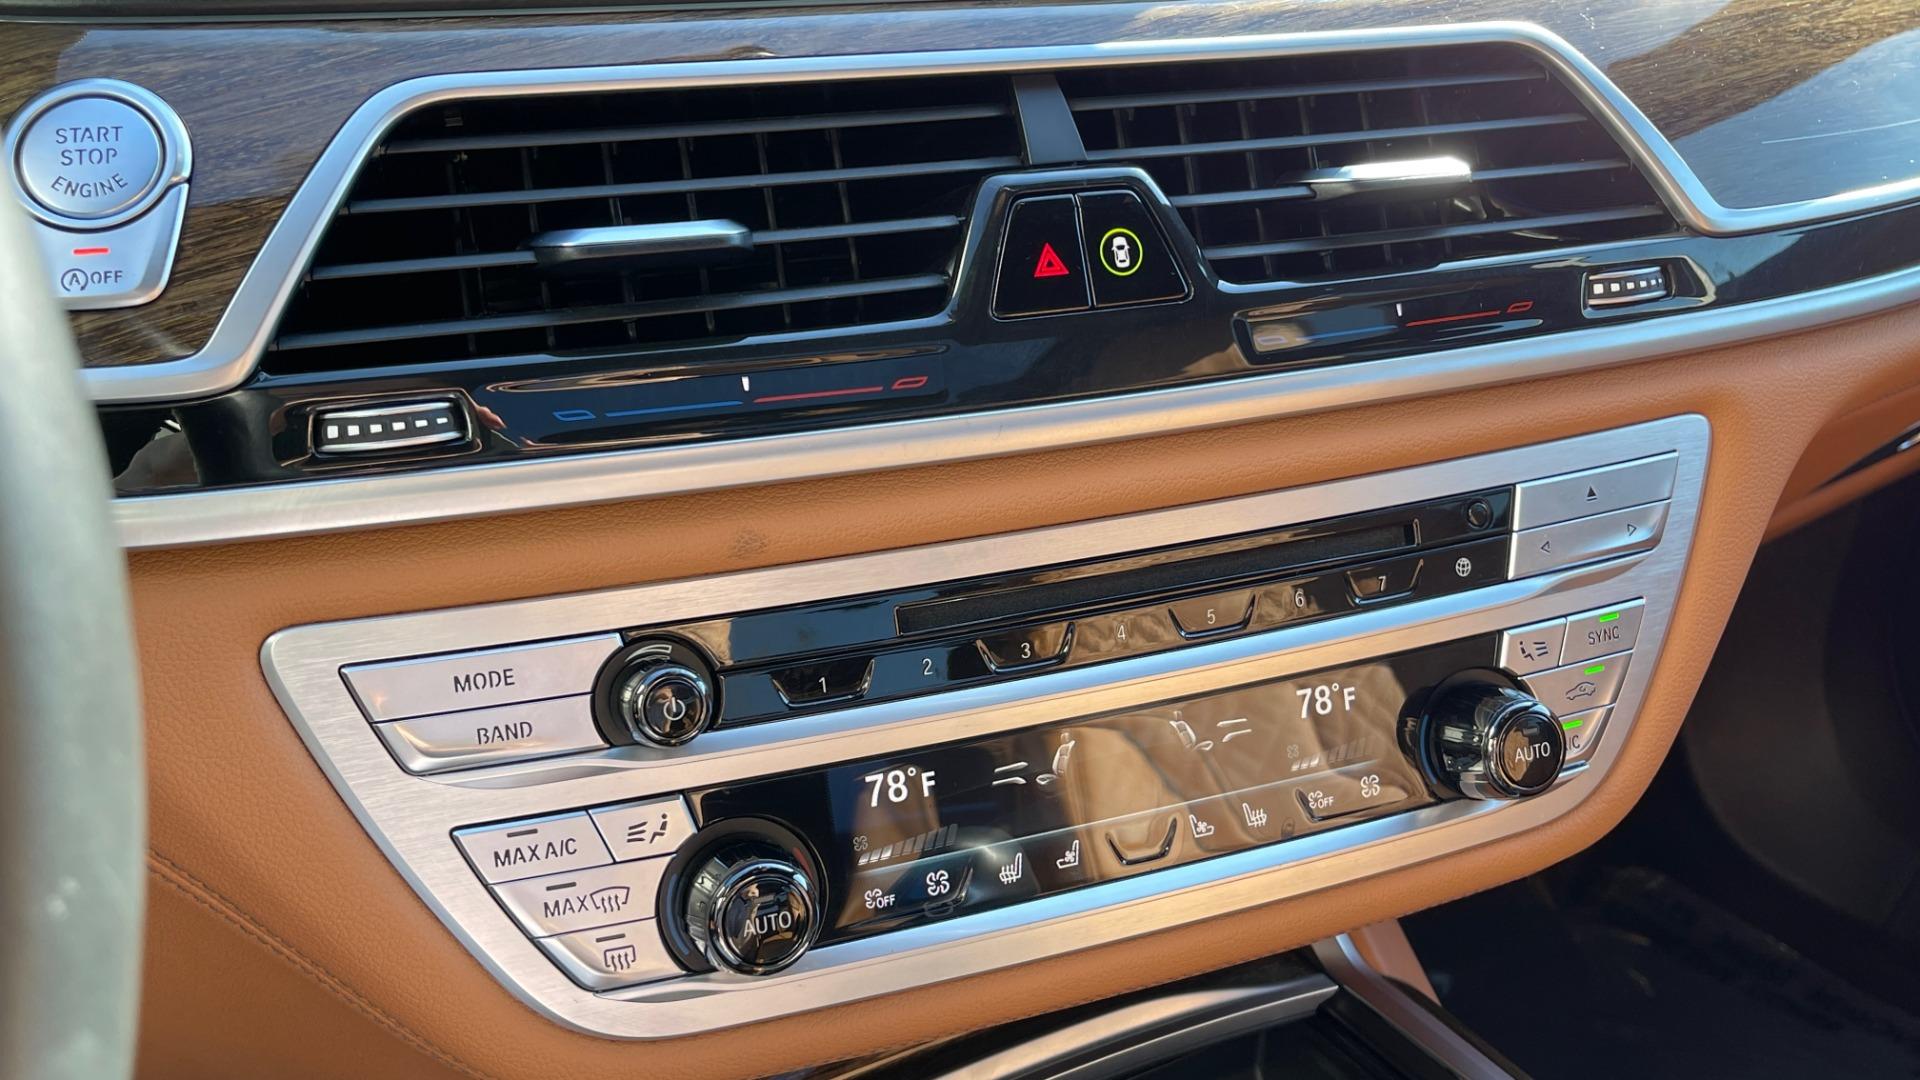 Used 2019 BMW 7 SERIES 750I XDRIVE M-SPORT / EXEC PKG / DRVR ASST PLUS / CLD WTHR / PAR for sale $60,995 at Formula Imports in Charlotte NC 28227 37